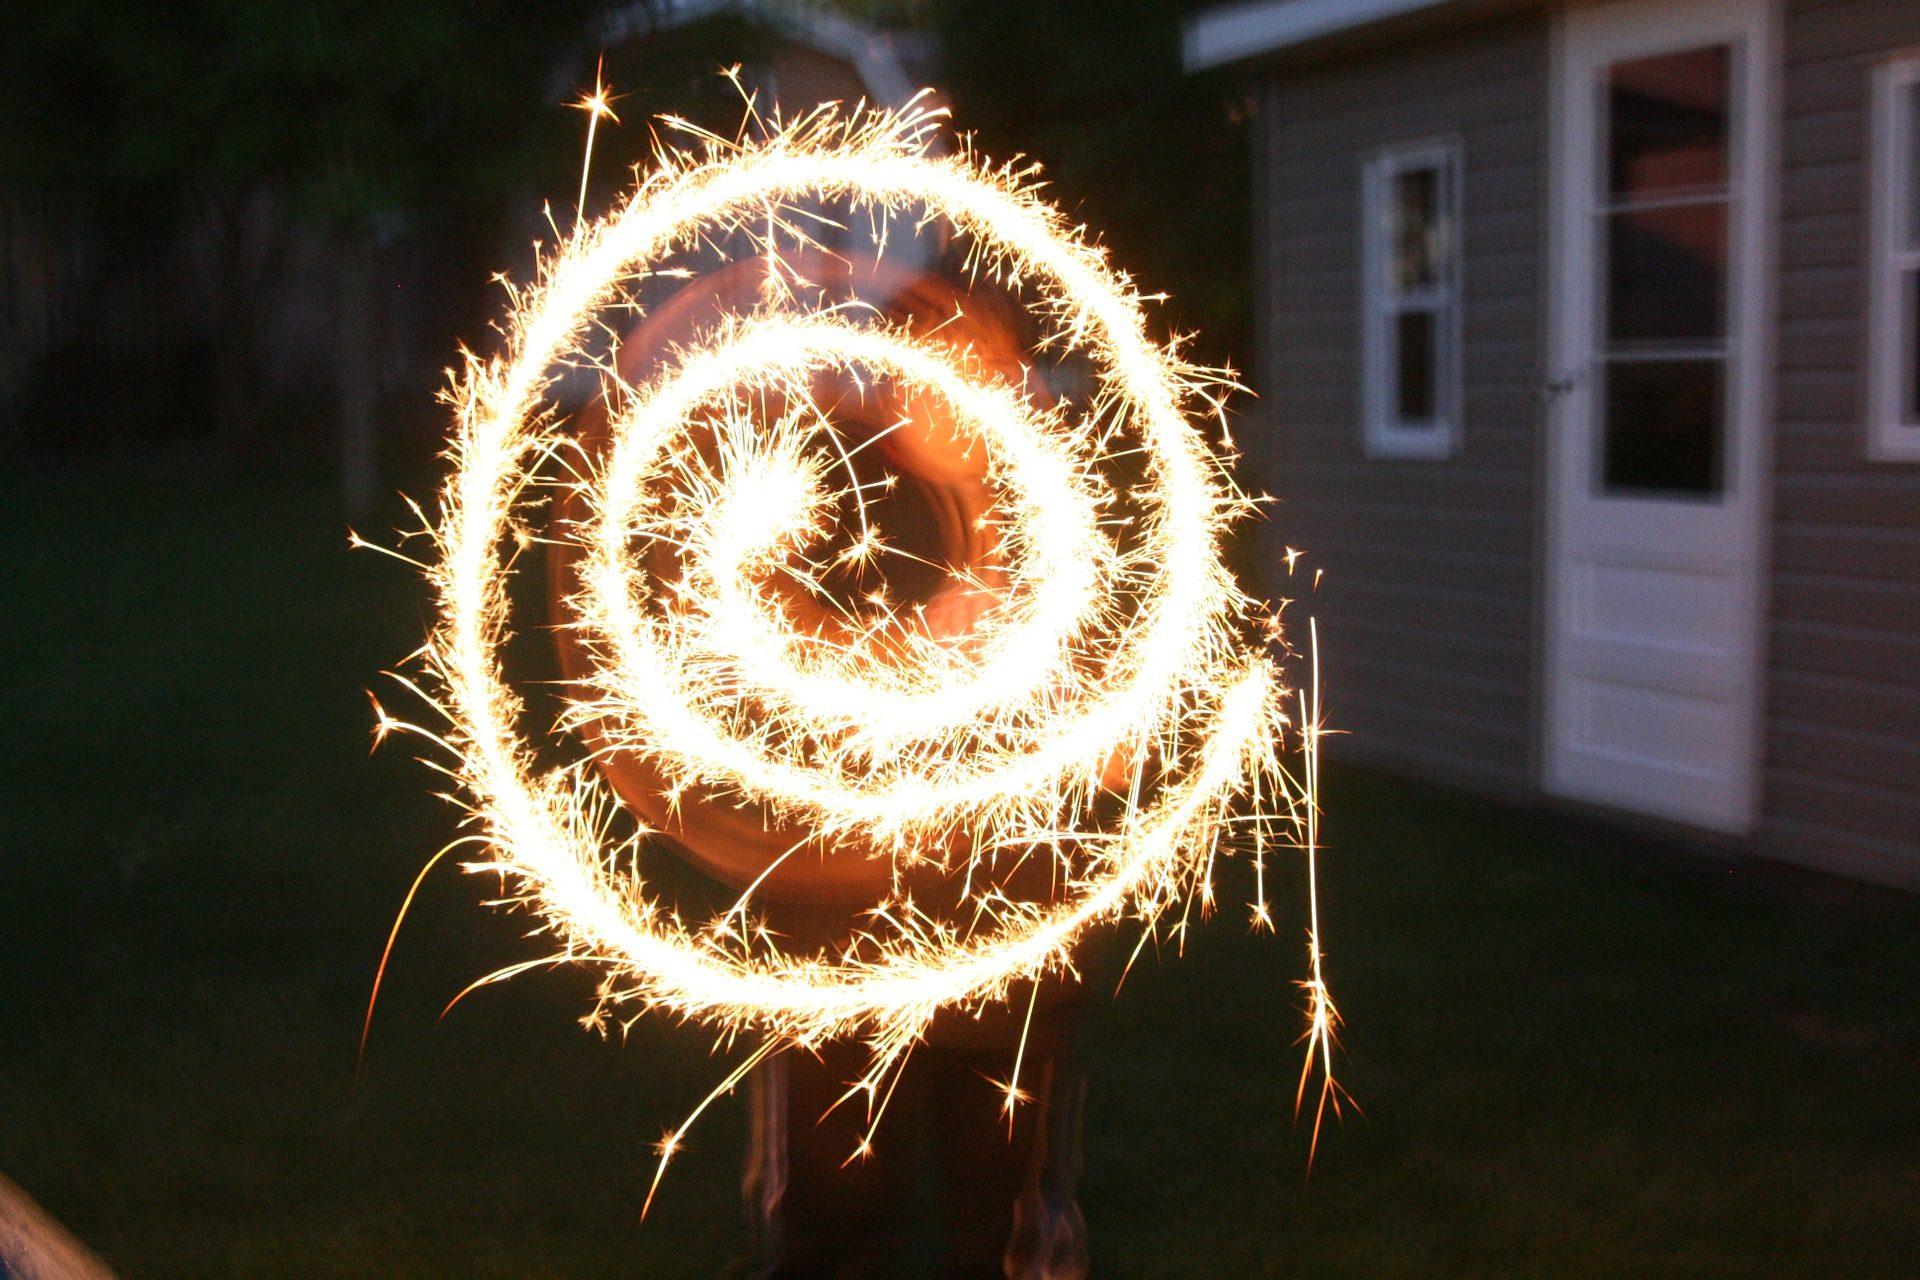 espiral, fuego, chispas, bengala, anochecer, oscuridad, brillo - Fondos de Pantalla HD - professor-falken.com